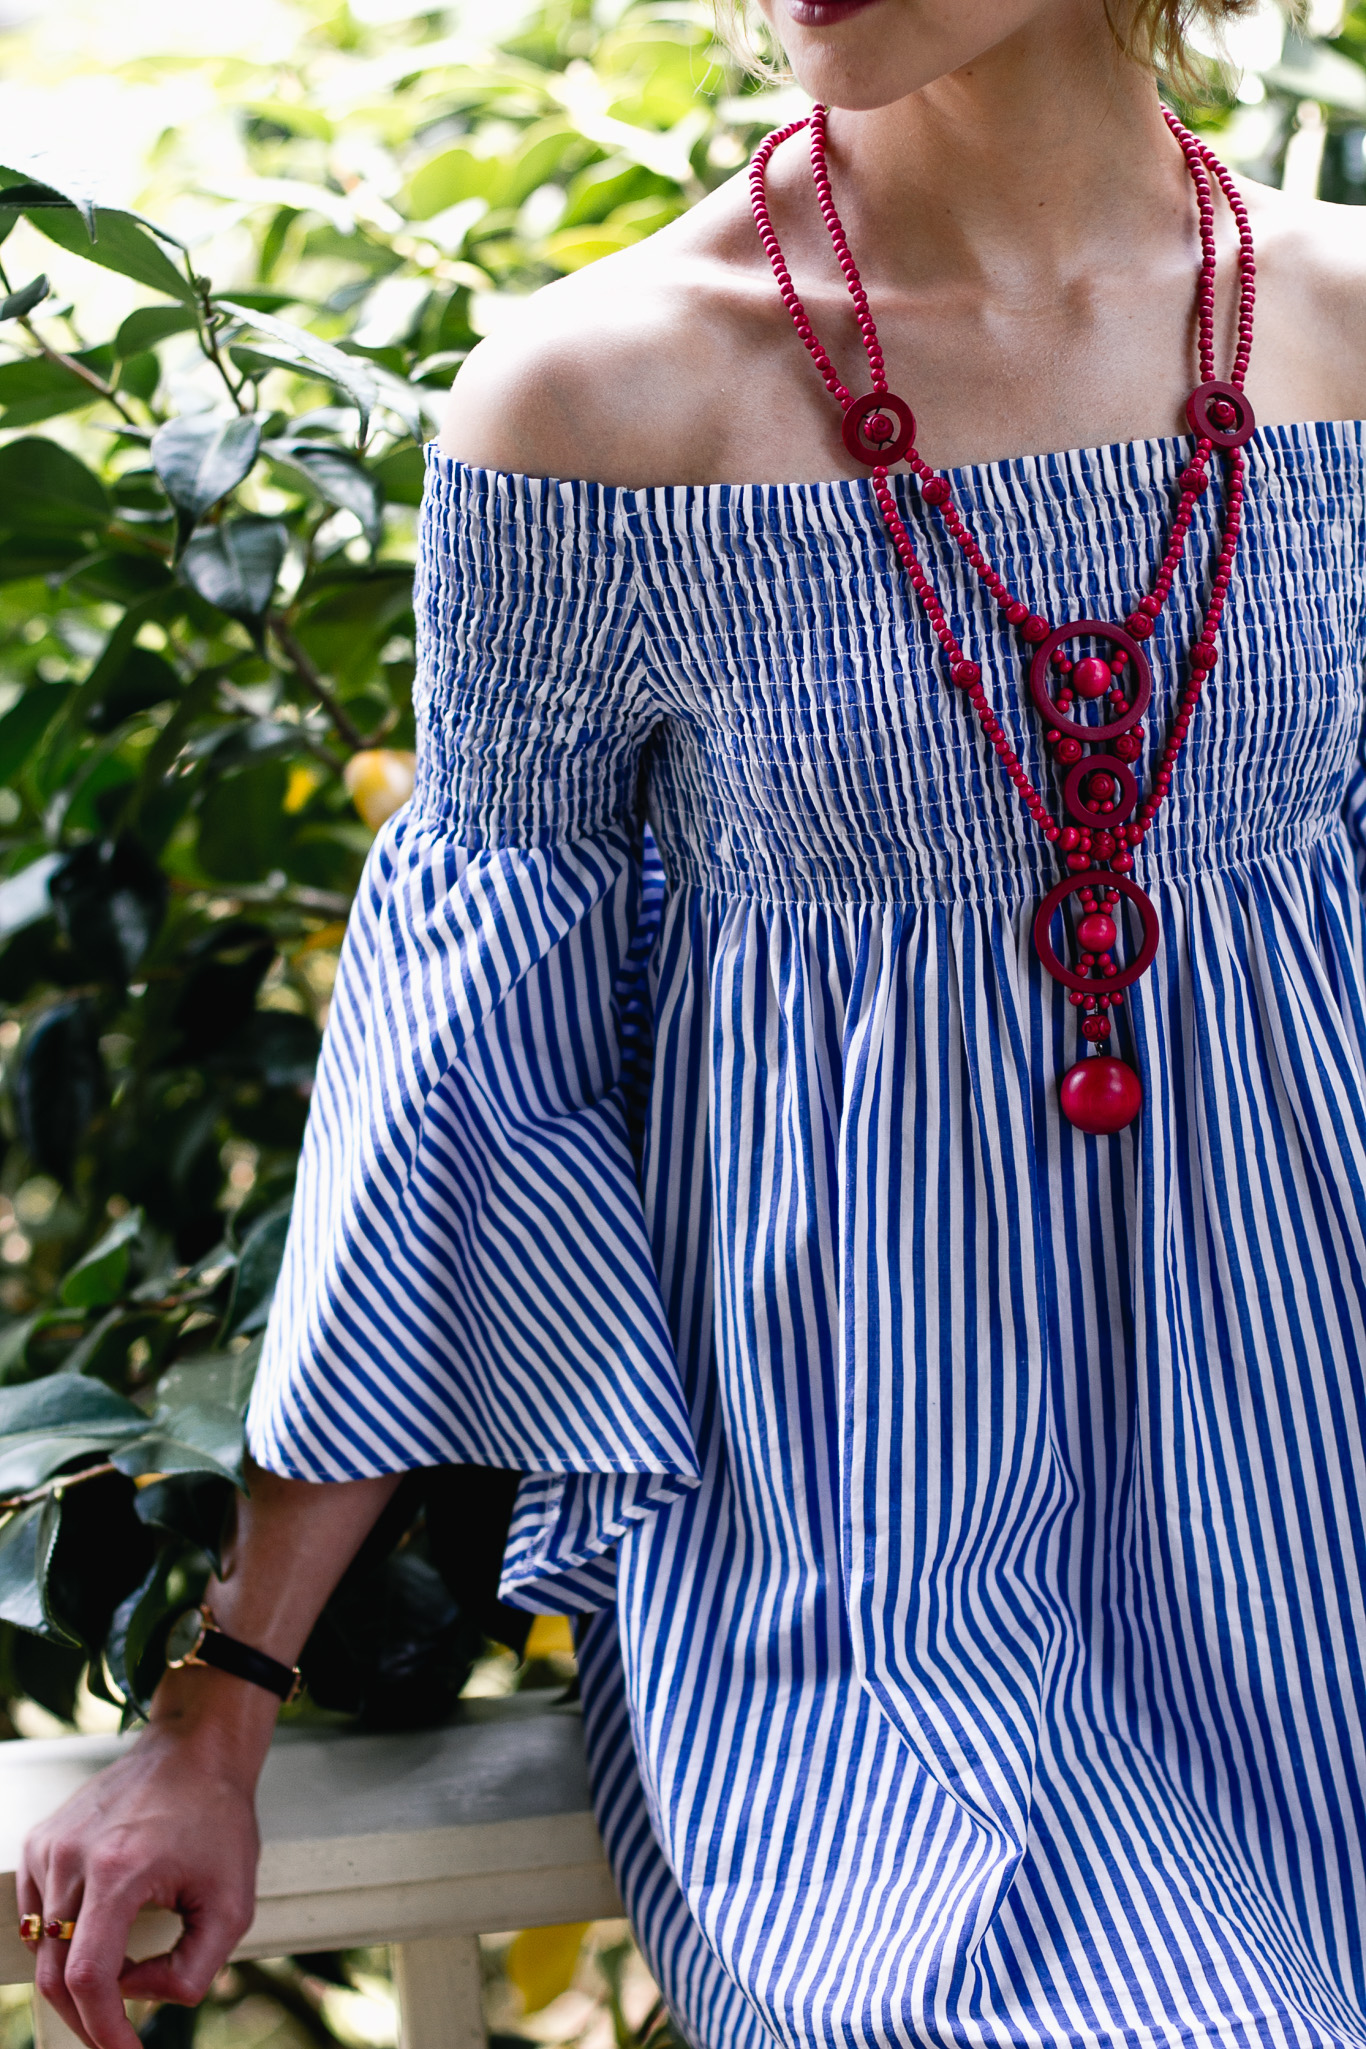 Zara pinstripe dress and vintage necklace